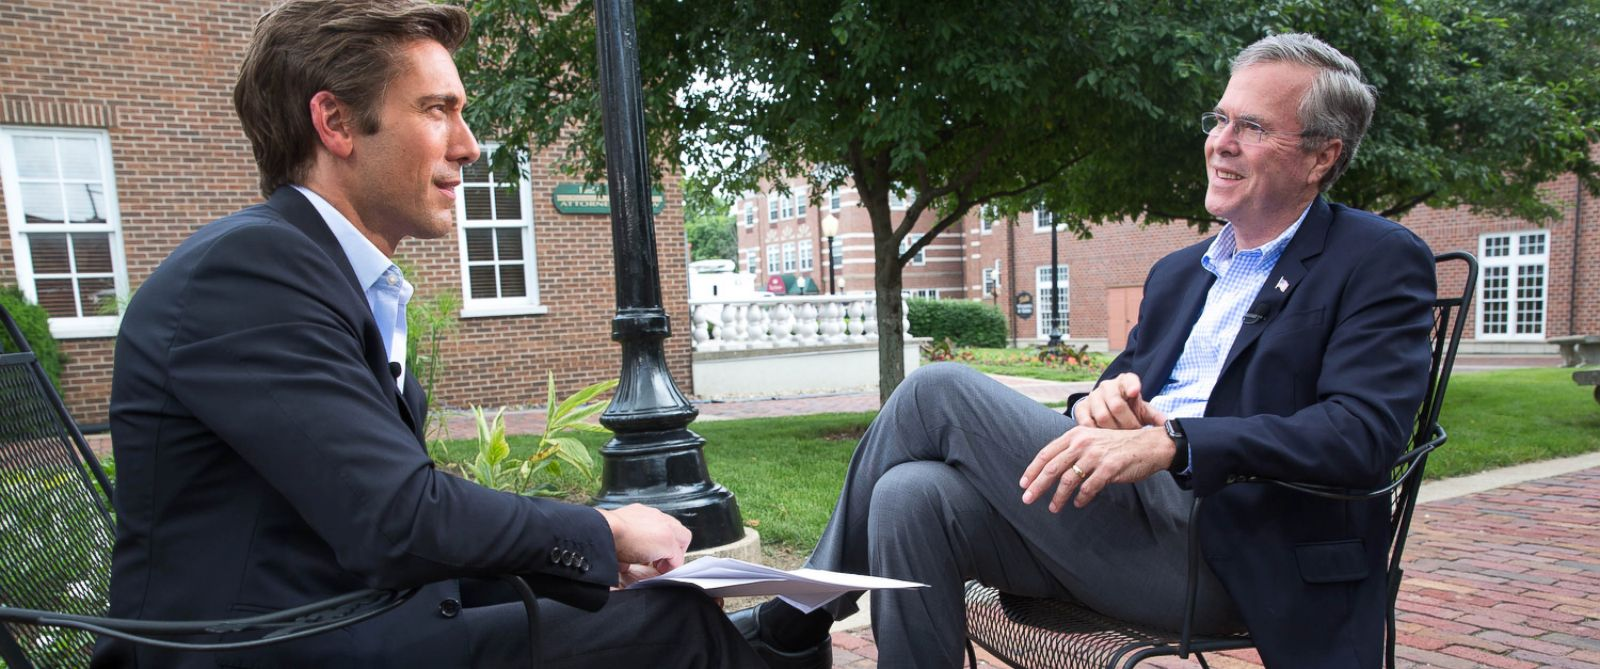 PHOTO: ABCs David Muir speaks with Republican presidential hopeful Jeb Bush, June 17, 2015, before a town hall meeting in Pella, Iowa.